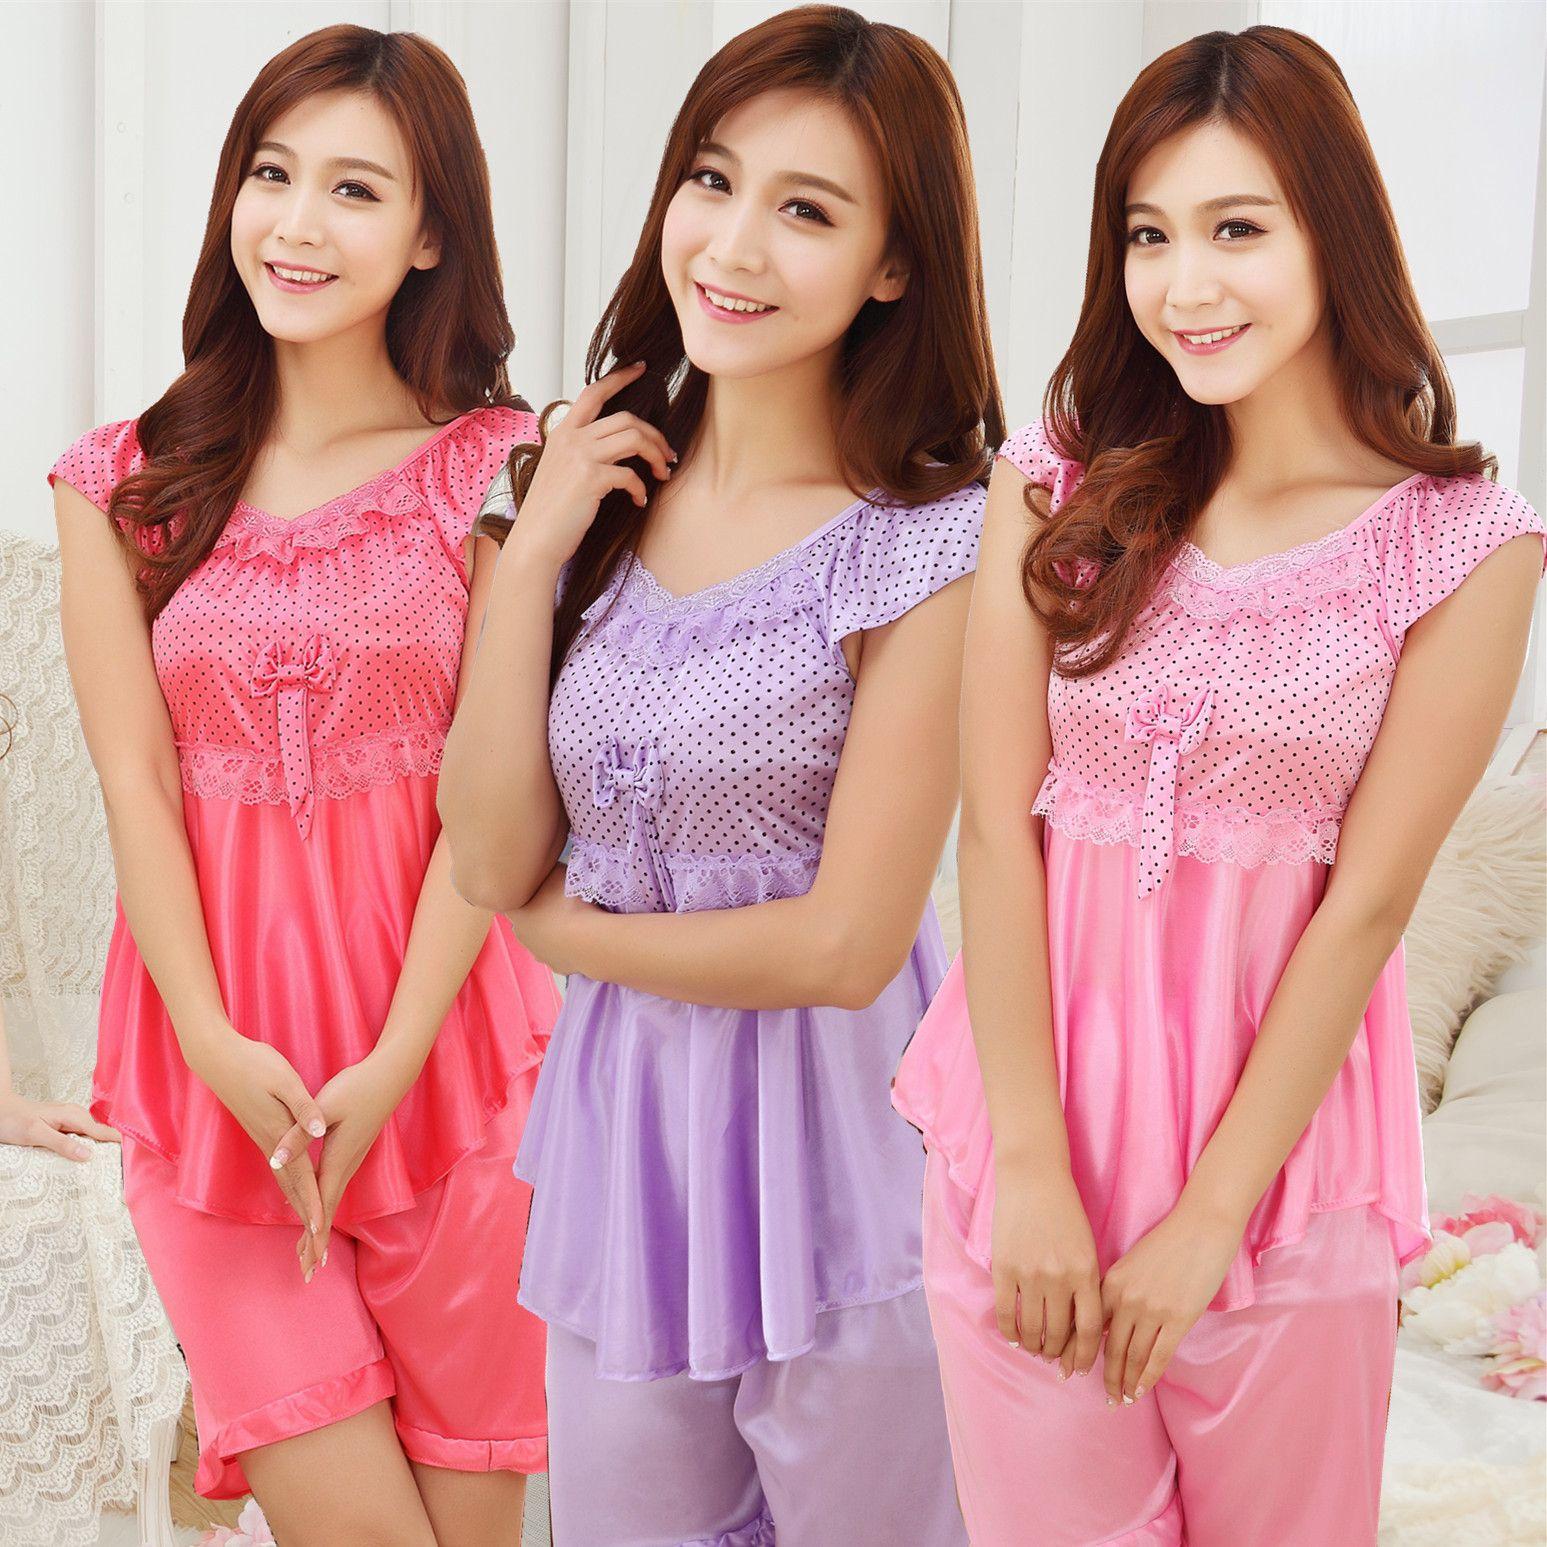 2019 Wholesale New Summer Ladies Pyjama Sexy Silk Nightgown Short Sleeved Lace  Nightwear Rose Pajamas Set Two Piece Pijamas Mujer Women Set From Baimu bd6d3aa93